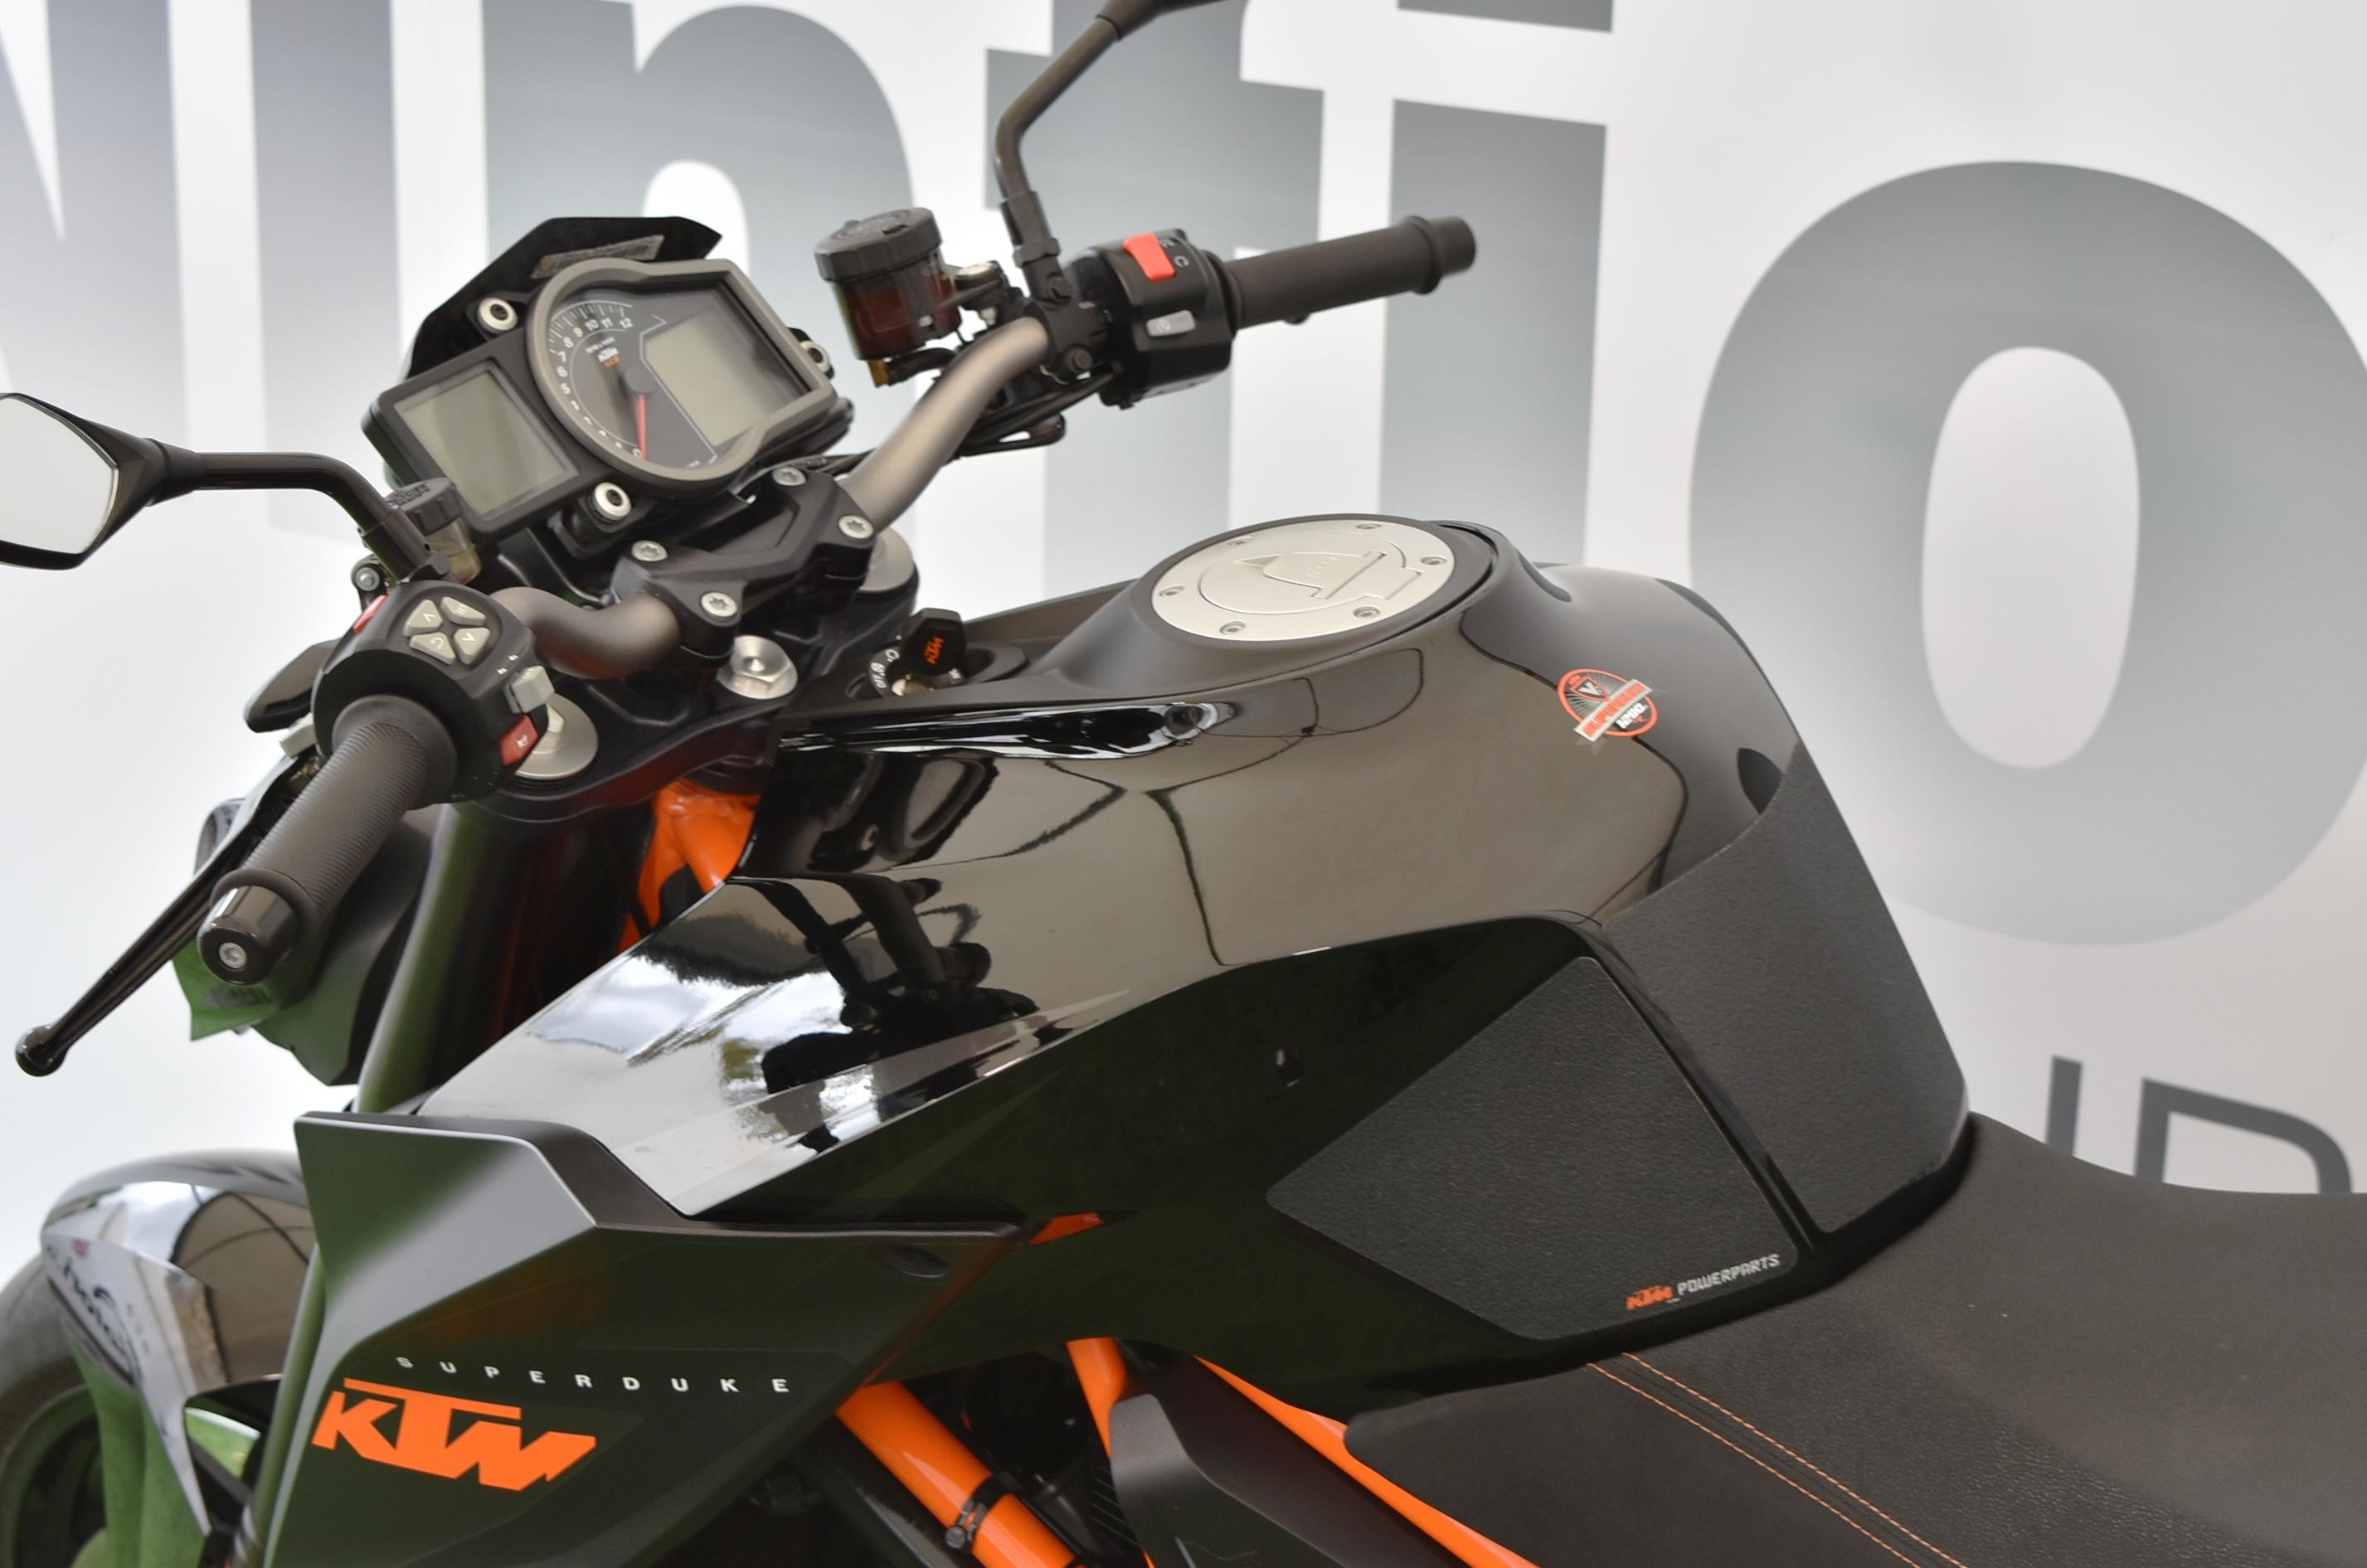 KTM 1290 SUPERDUKE R – 2016